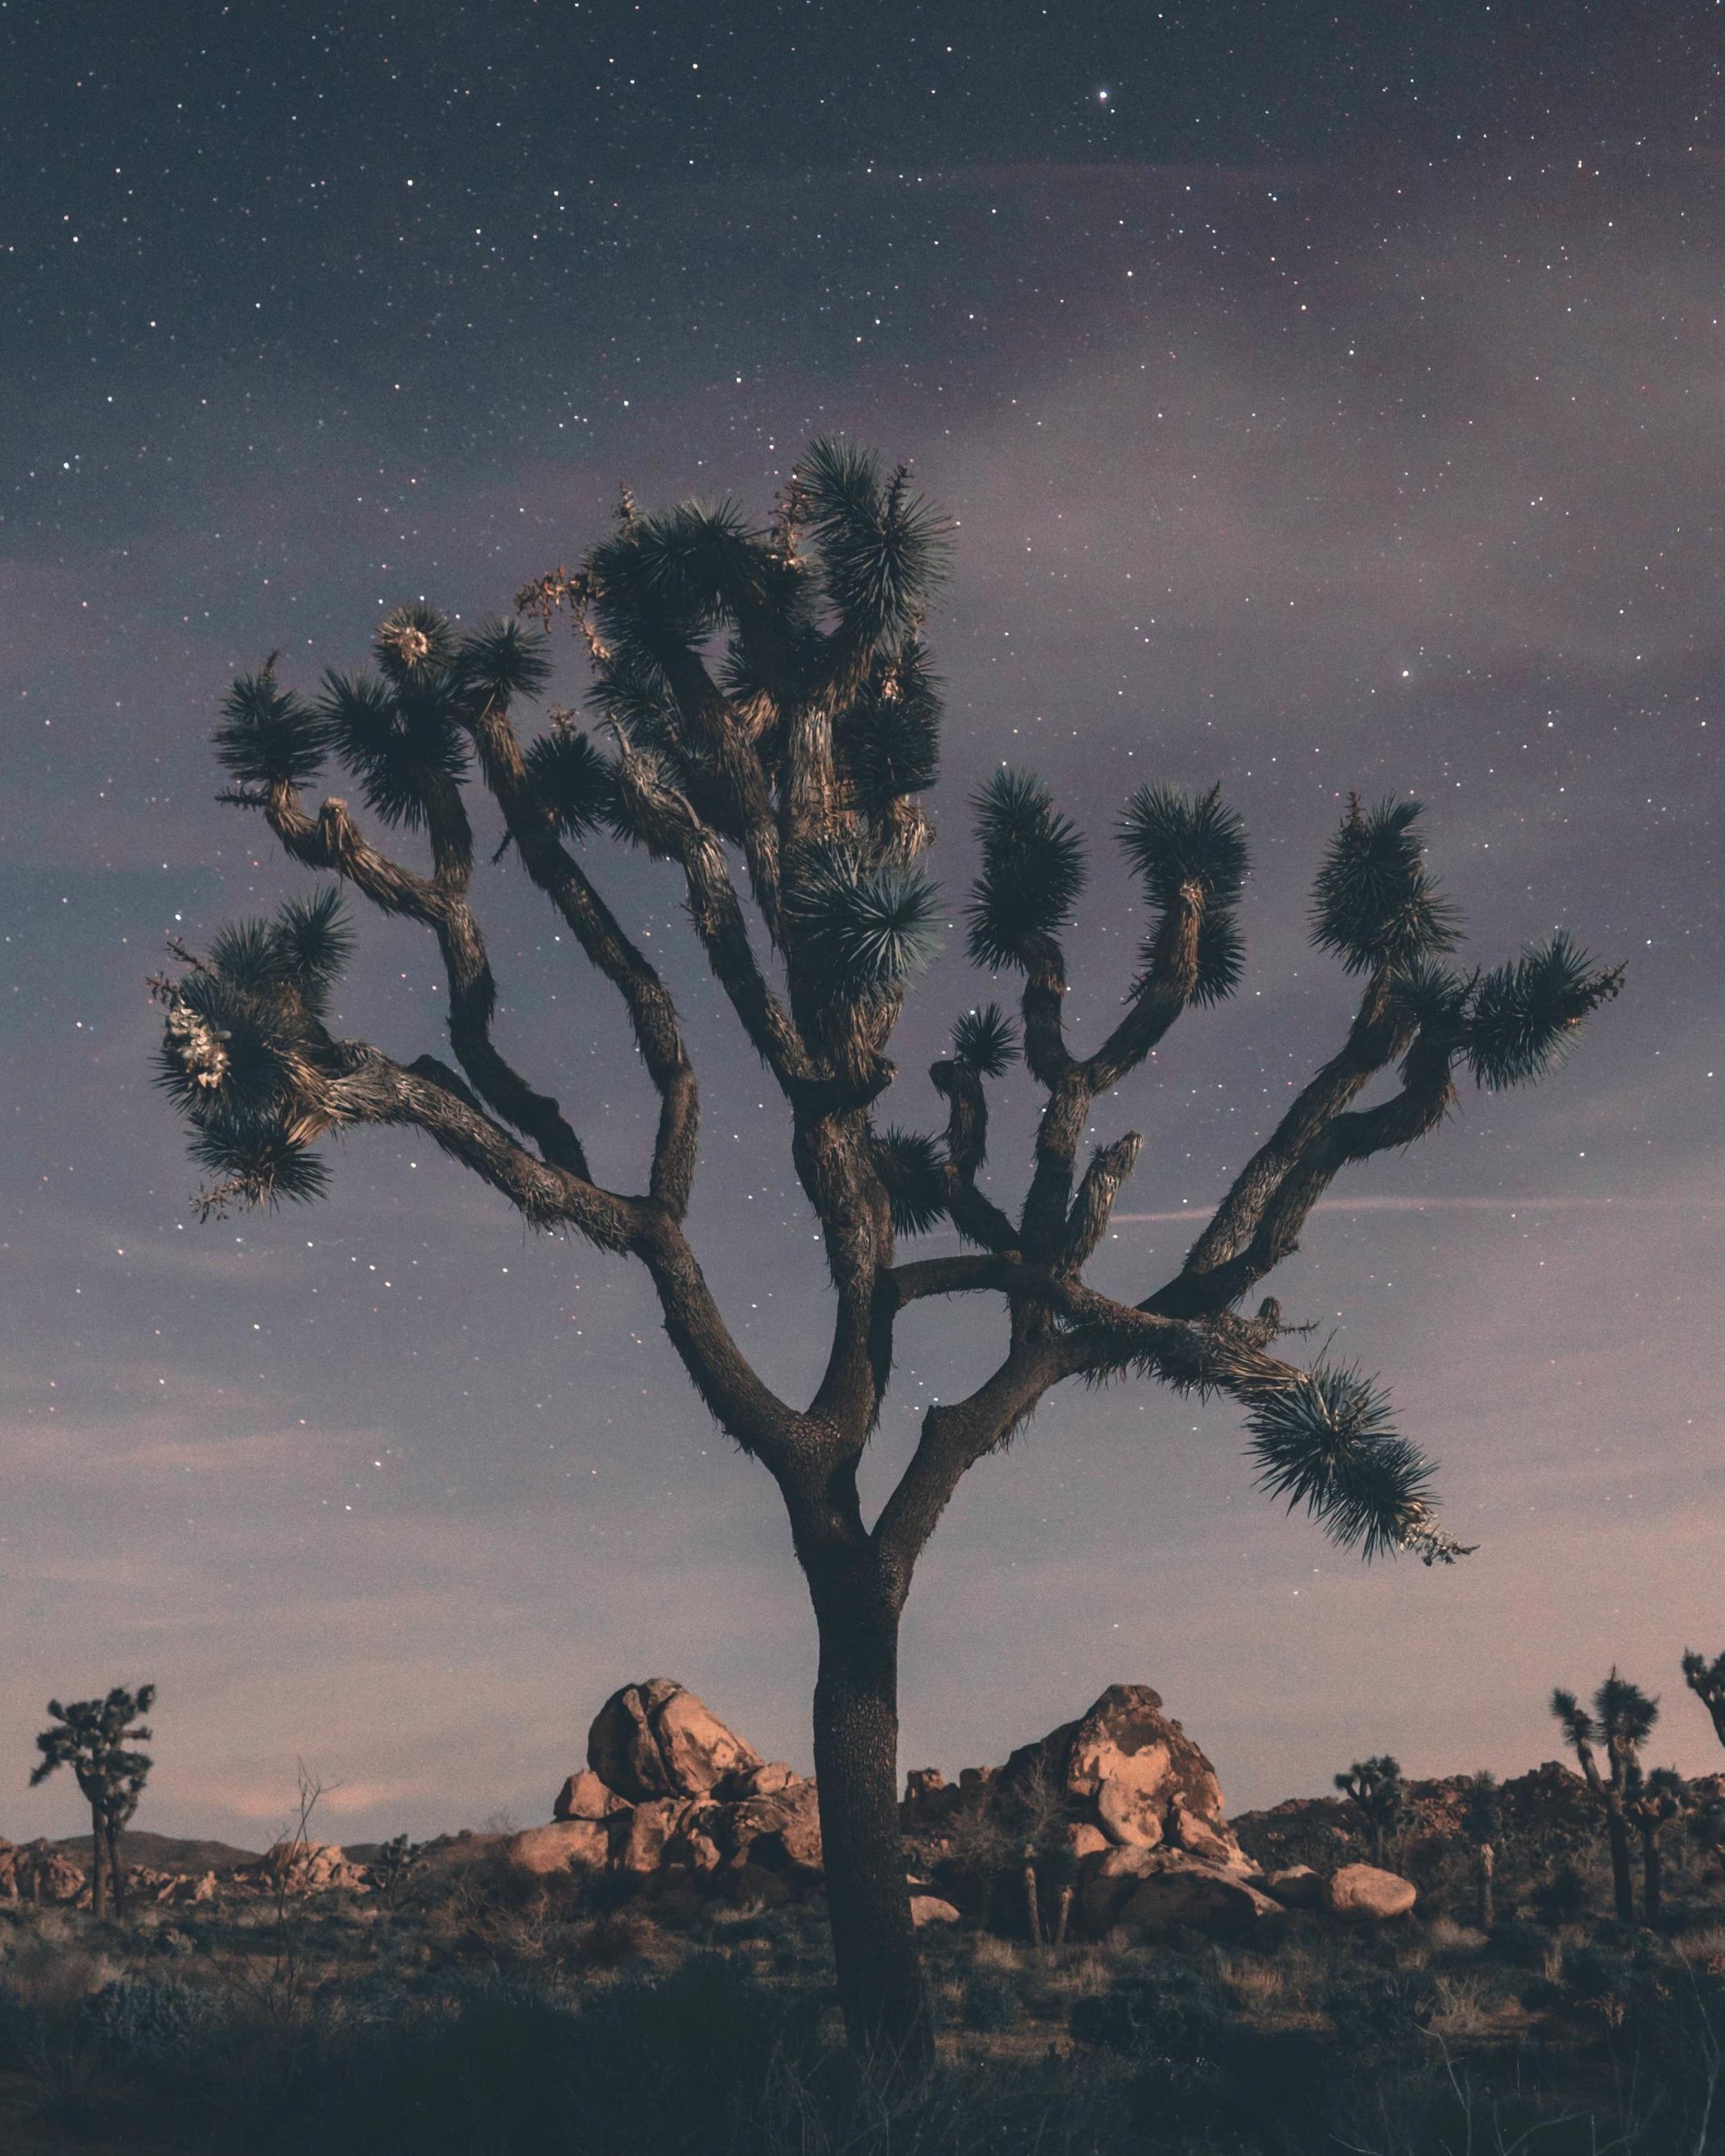 Nocturnal - Joshua Tree, 2017